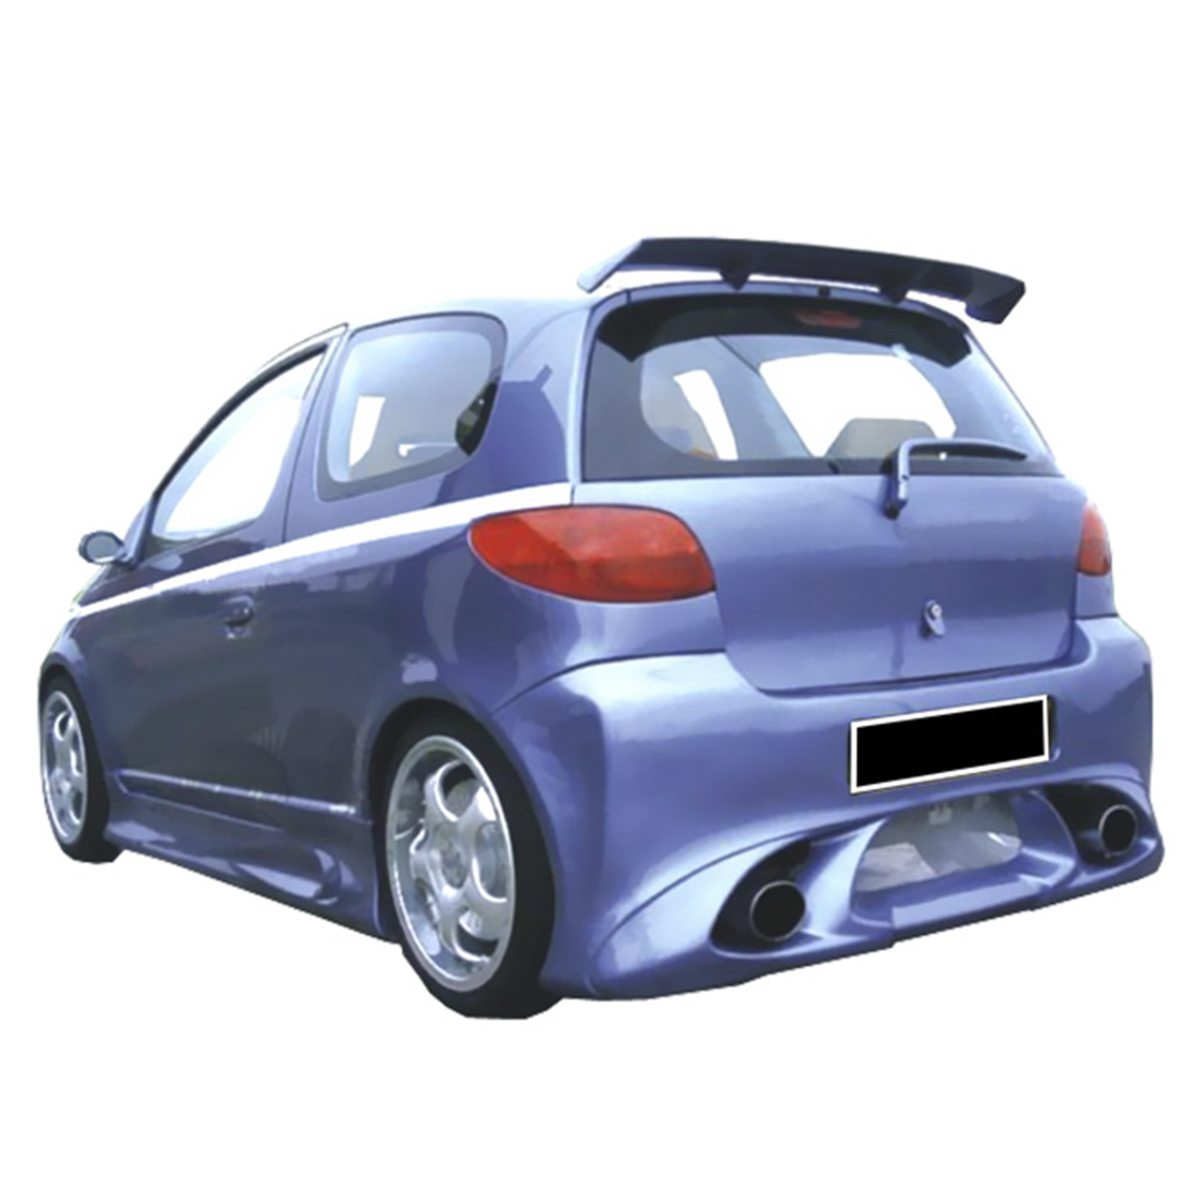 Toyota-Yaris-Infinity-Tras-PCS136